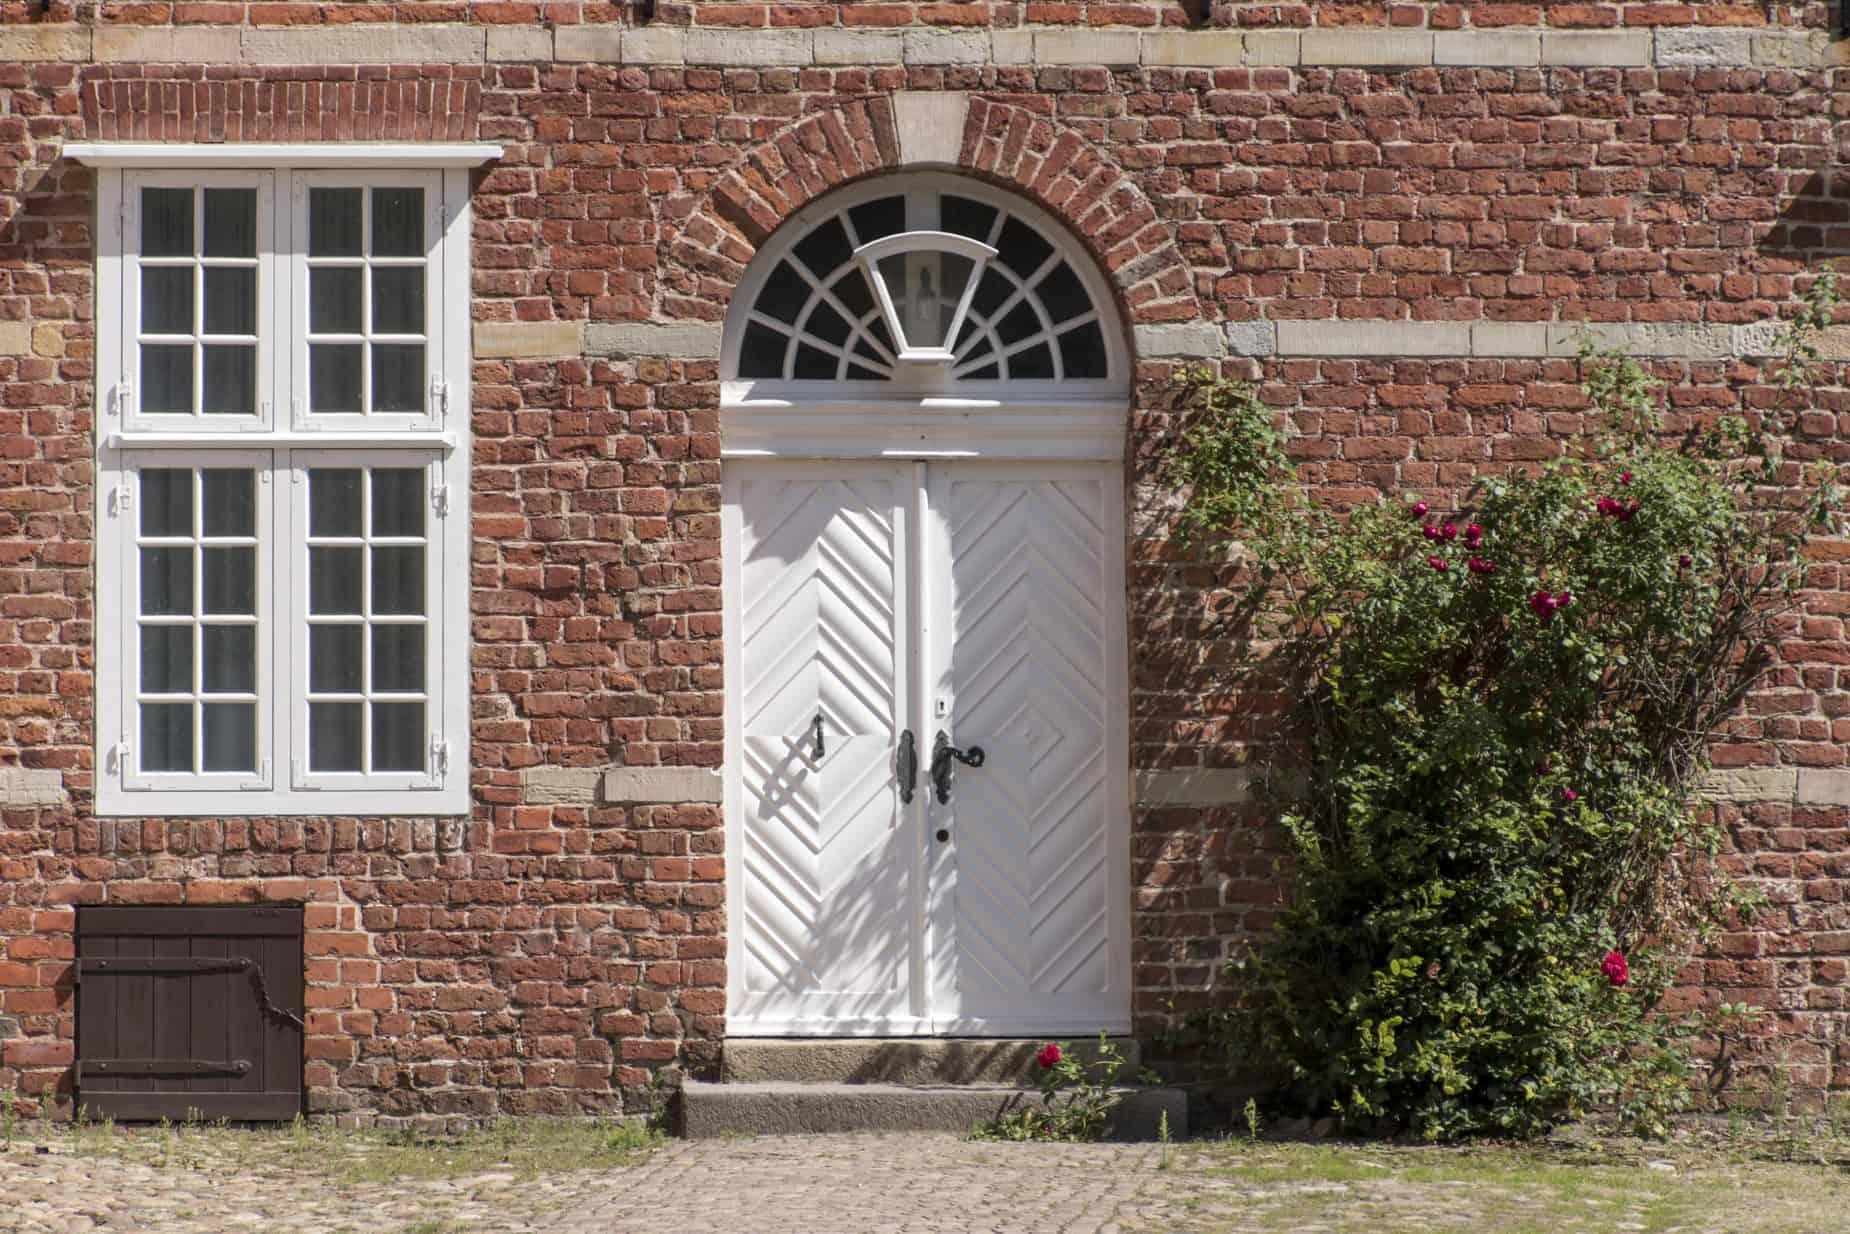 Transom window above white entrance of historic brick building